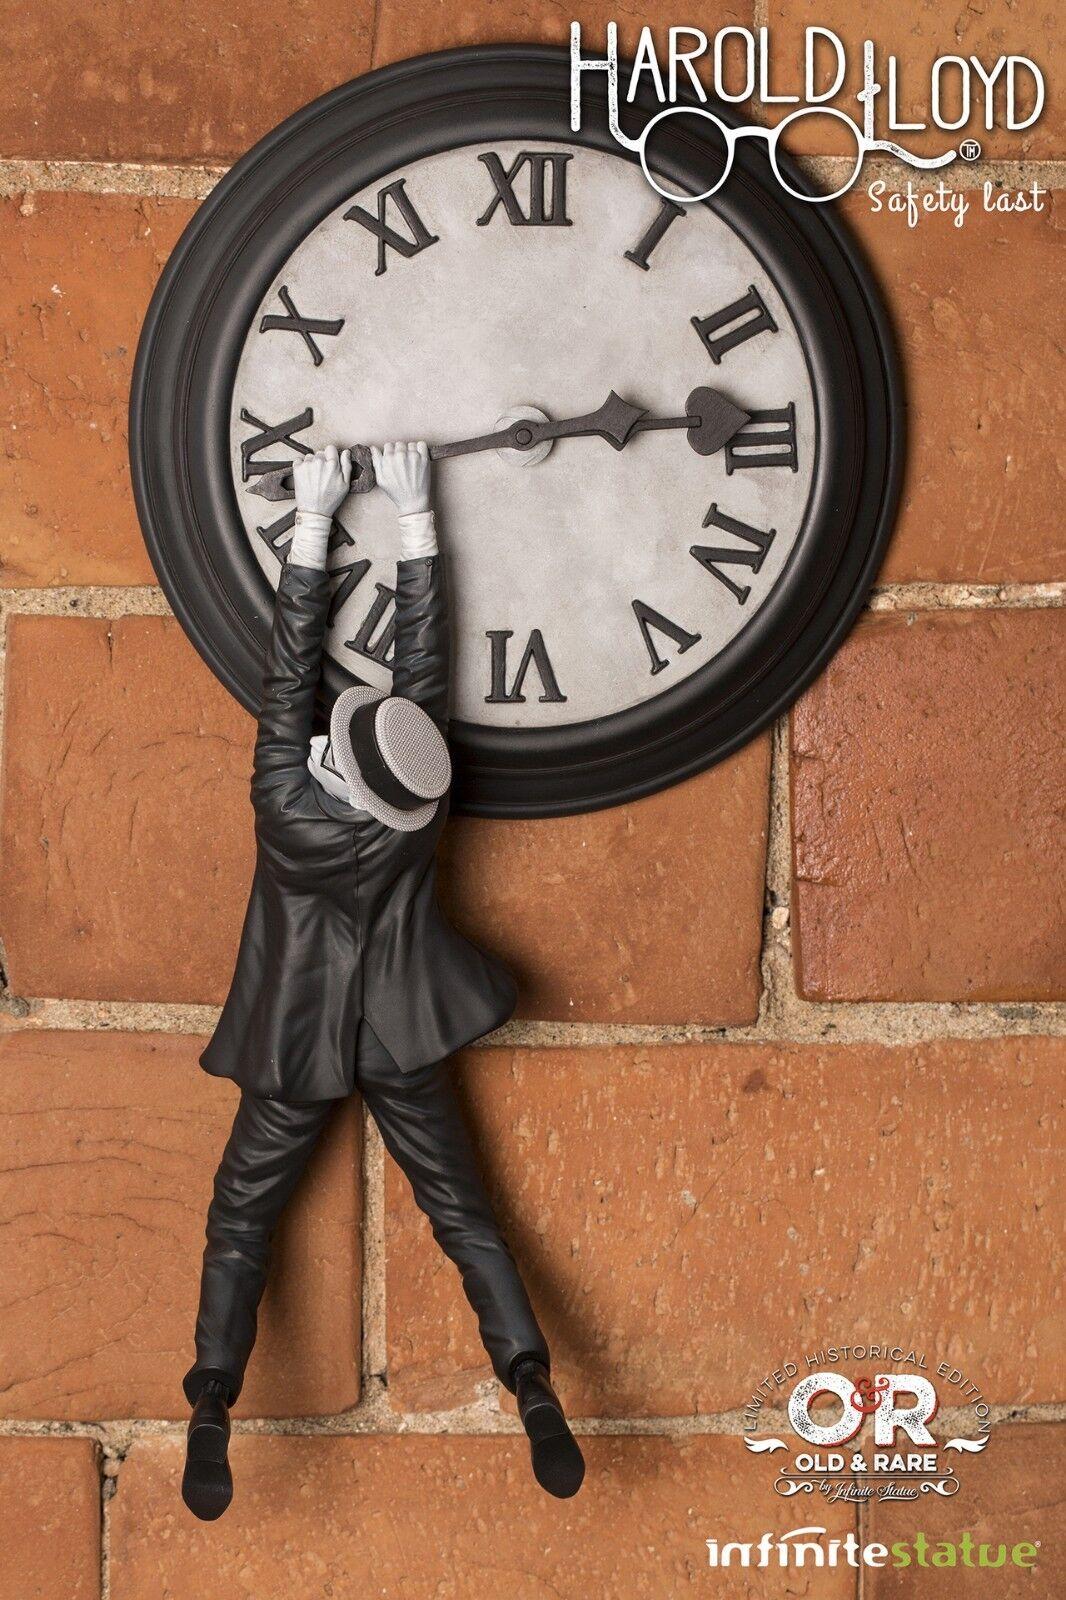 Harold Lloyd  Safety Last    Infinite Statue Limited Edition  250 Worldwide